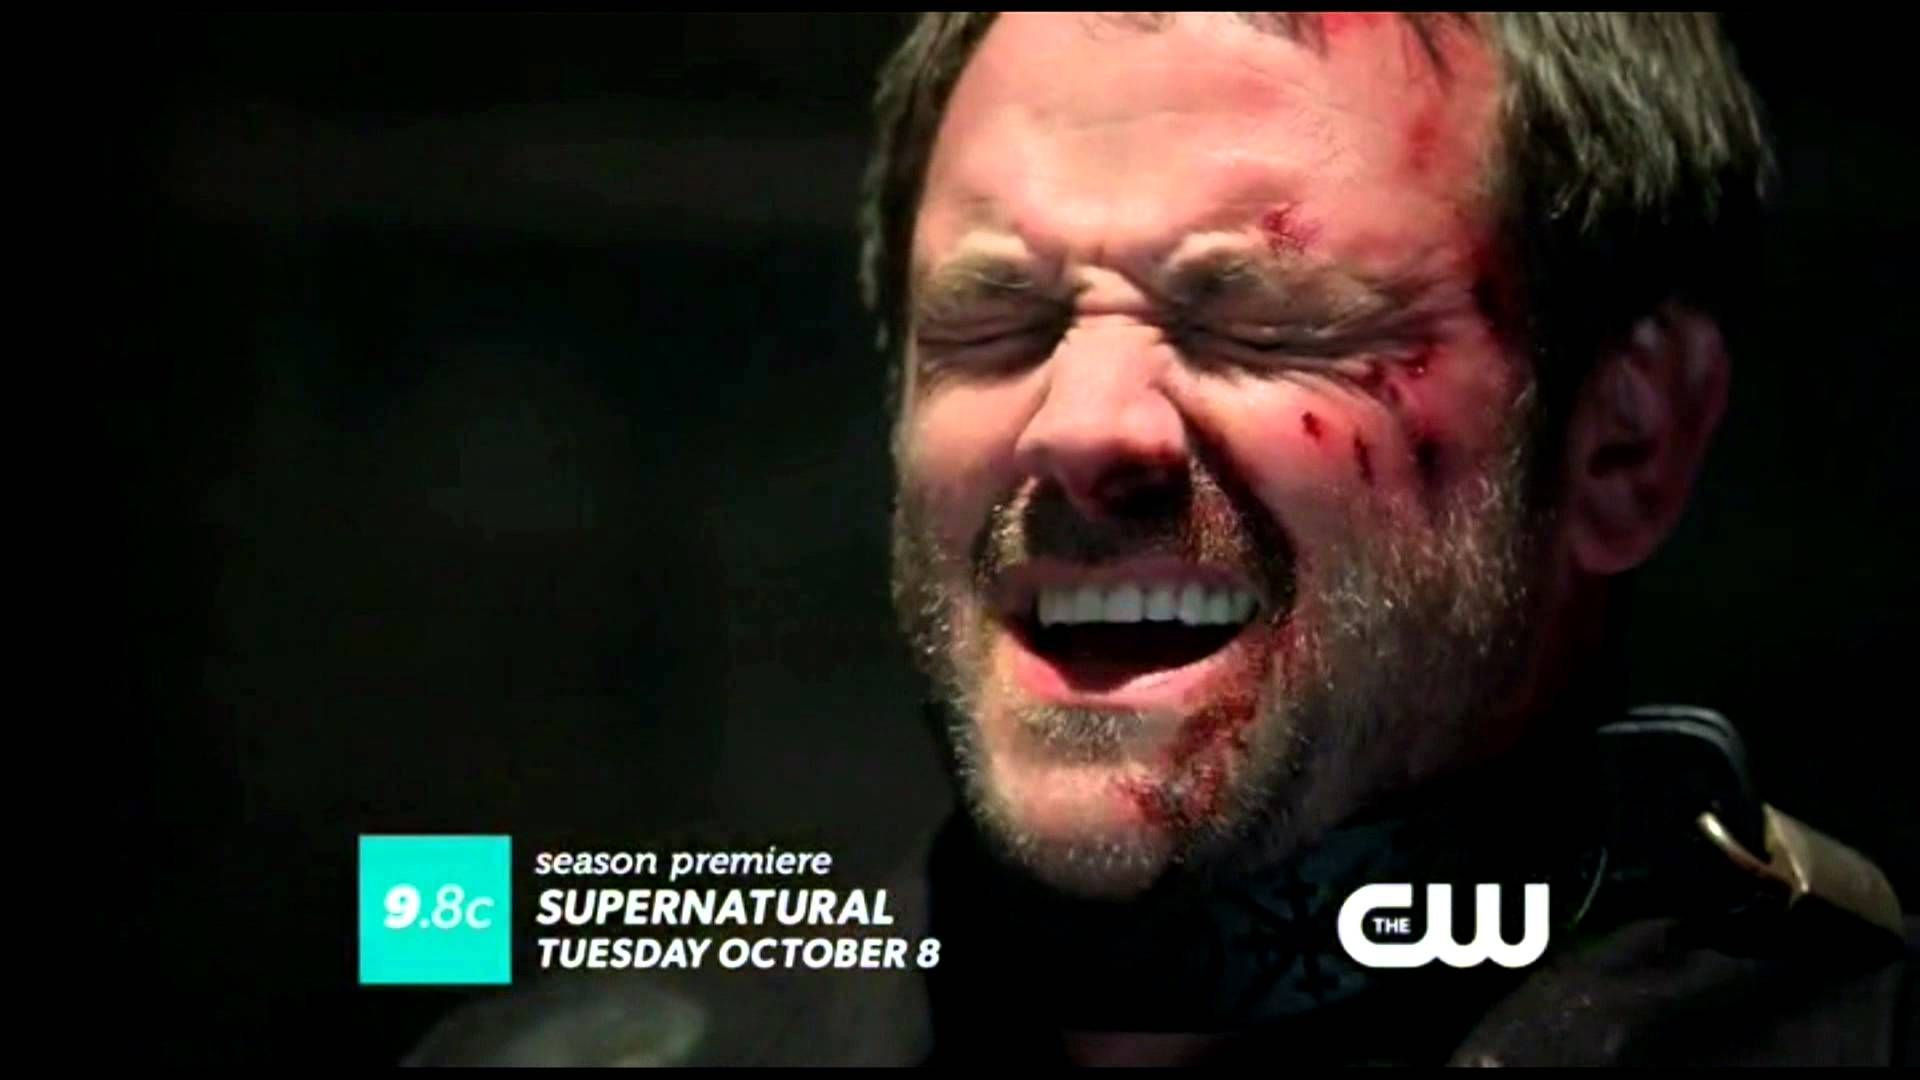 Supernatural season 9 waiting promo hd supernatural and supernatural season 9 waiting promo hd voltagebd Gallery